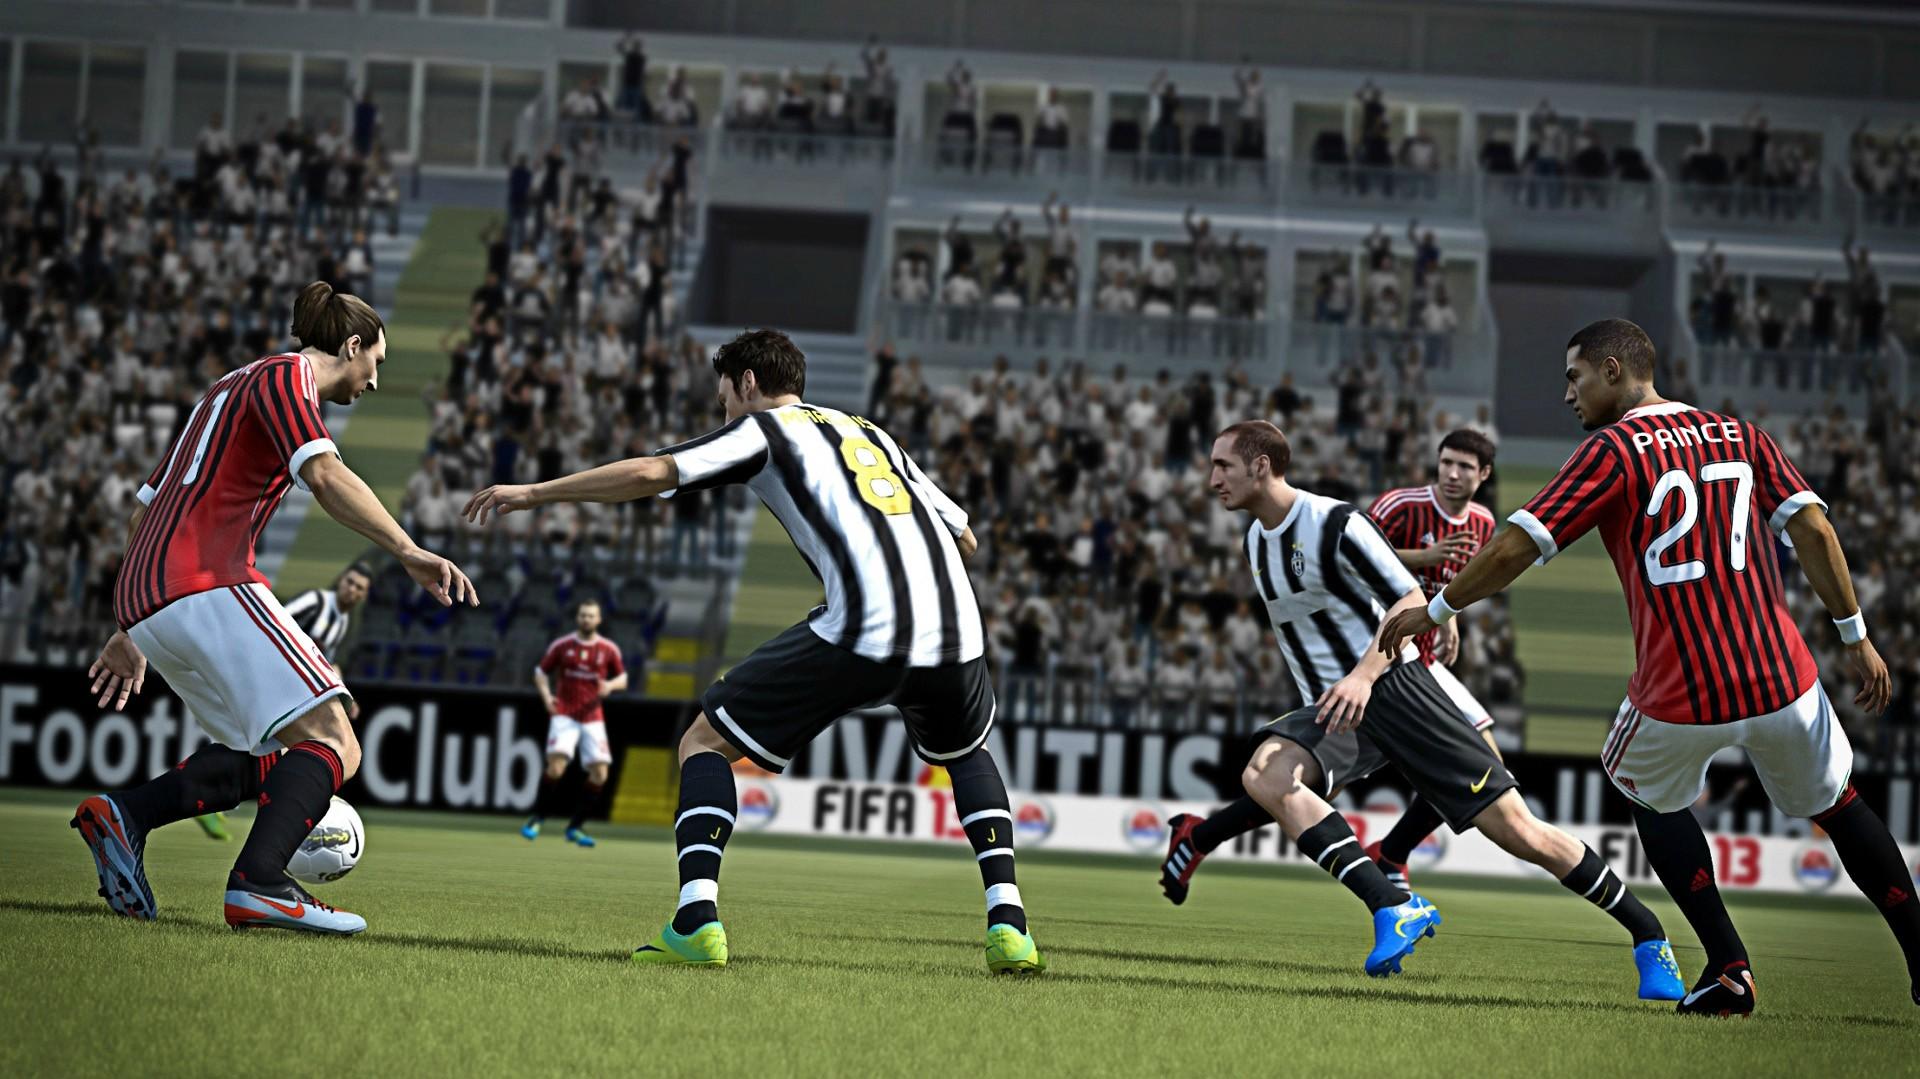 FIFA 13 DEMO PC CLUBIC TÉLÉCHARGER